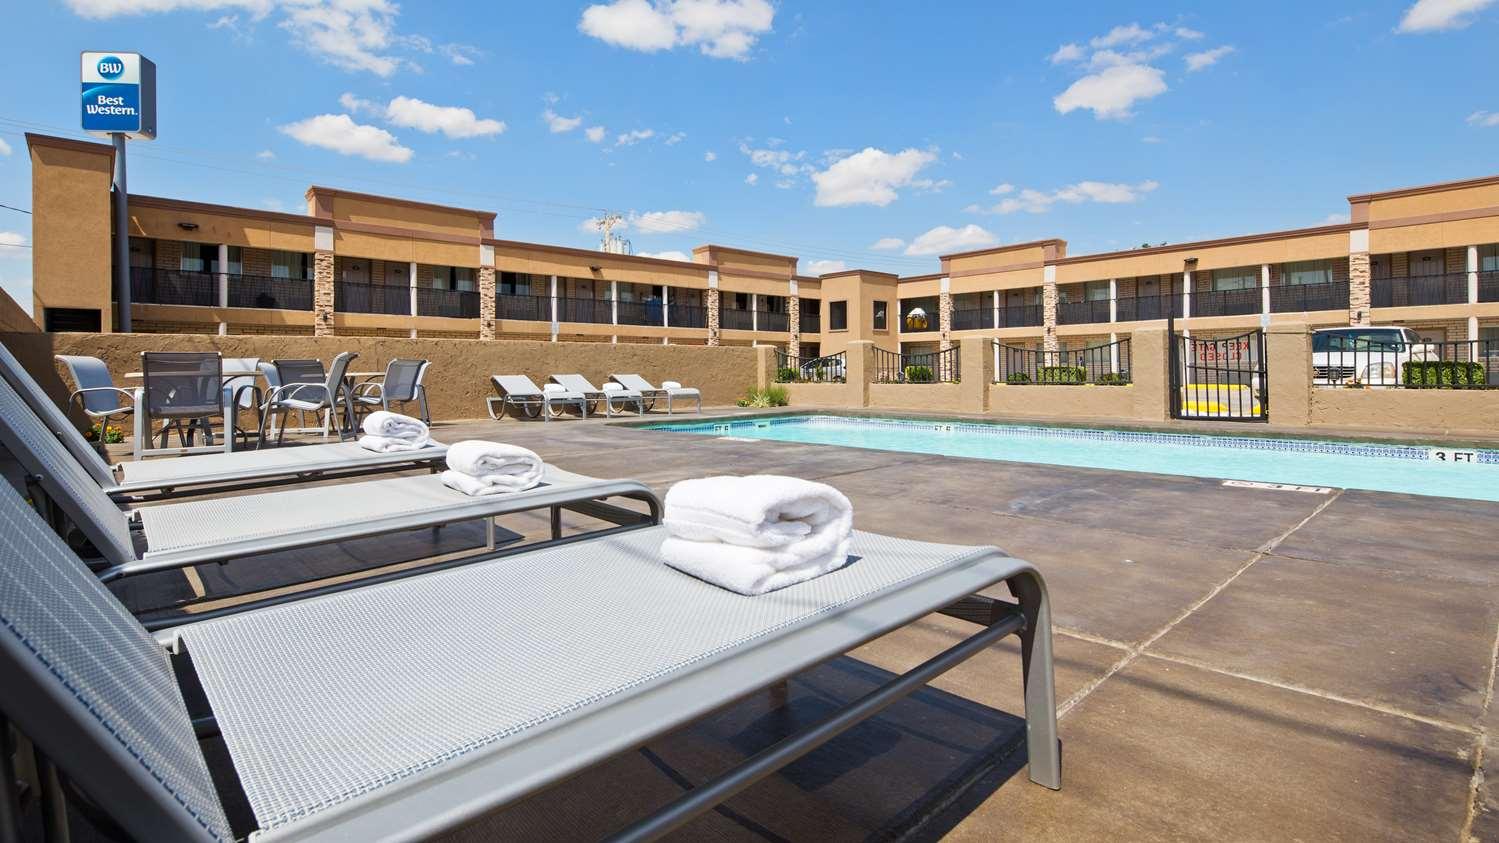 Pool - Best Western Nursanickel Motel Dalhart